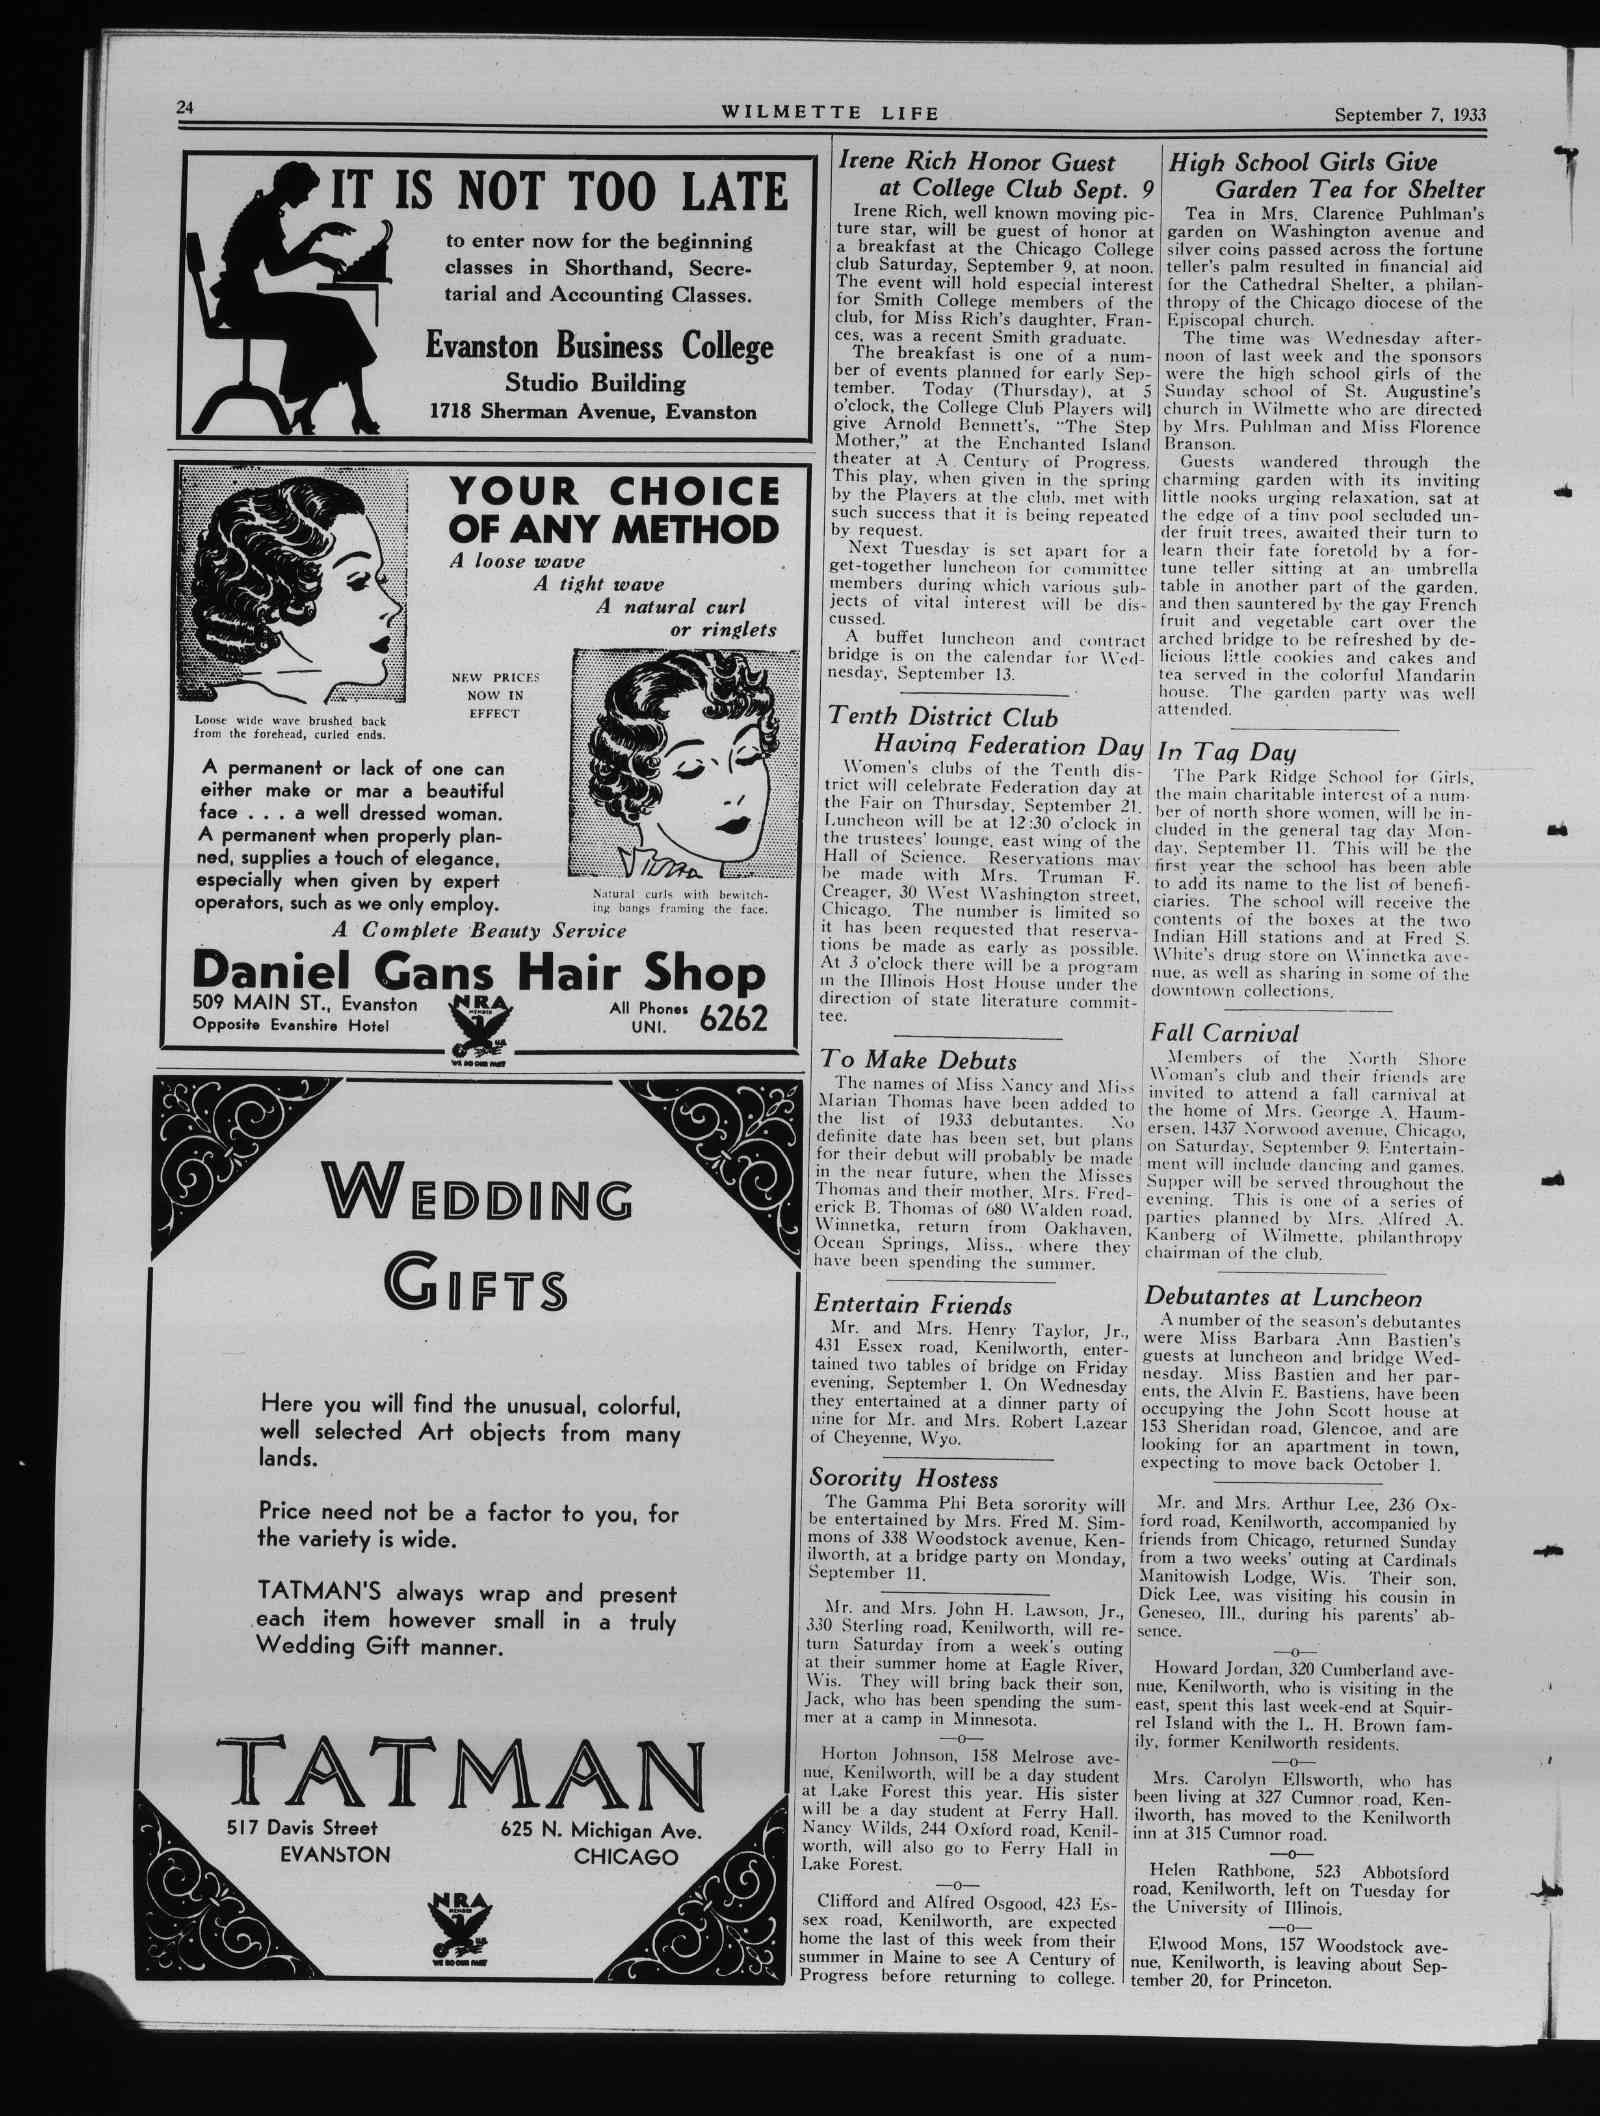 Wilmette Life (Wilmette, Illinois), 7 Sep 1933